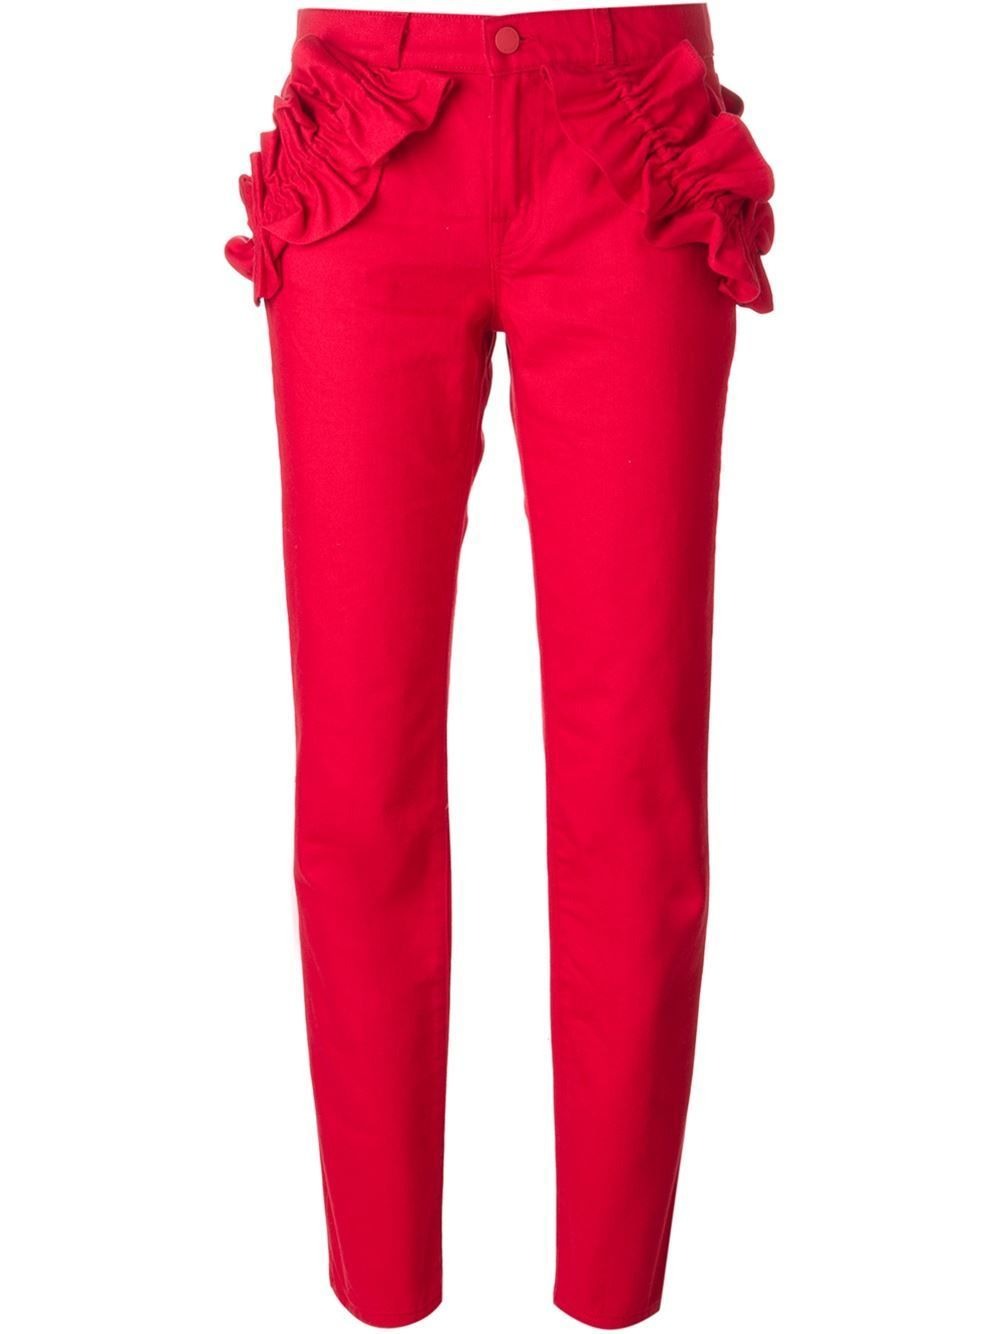 Pink dress emoji   Reasons Ruffles Are Our Favorite Fall Trend  Ruffles Pretty